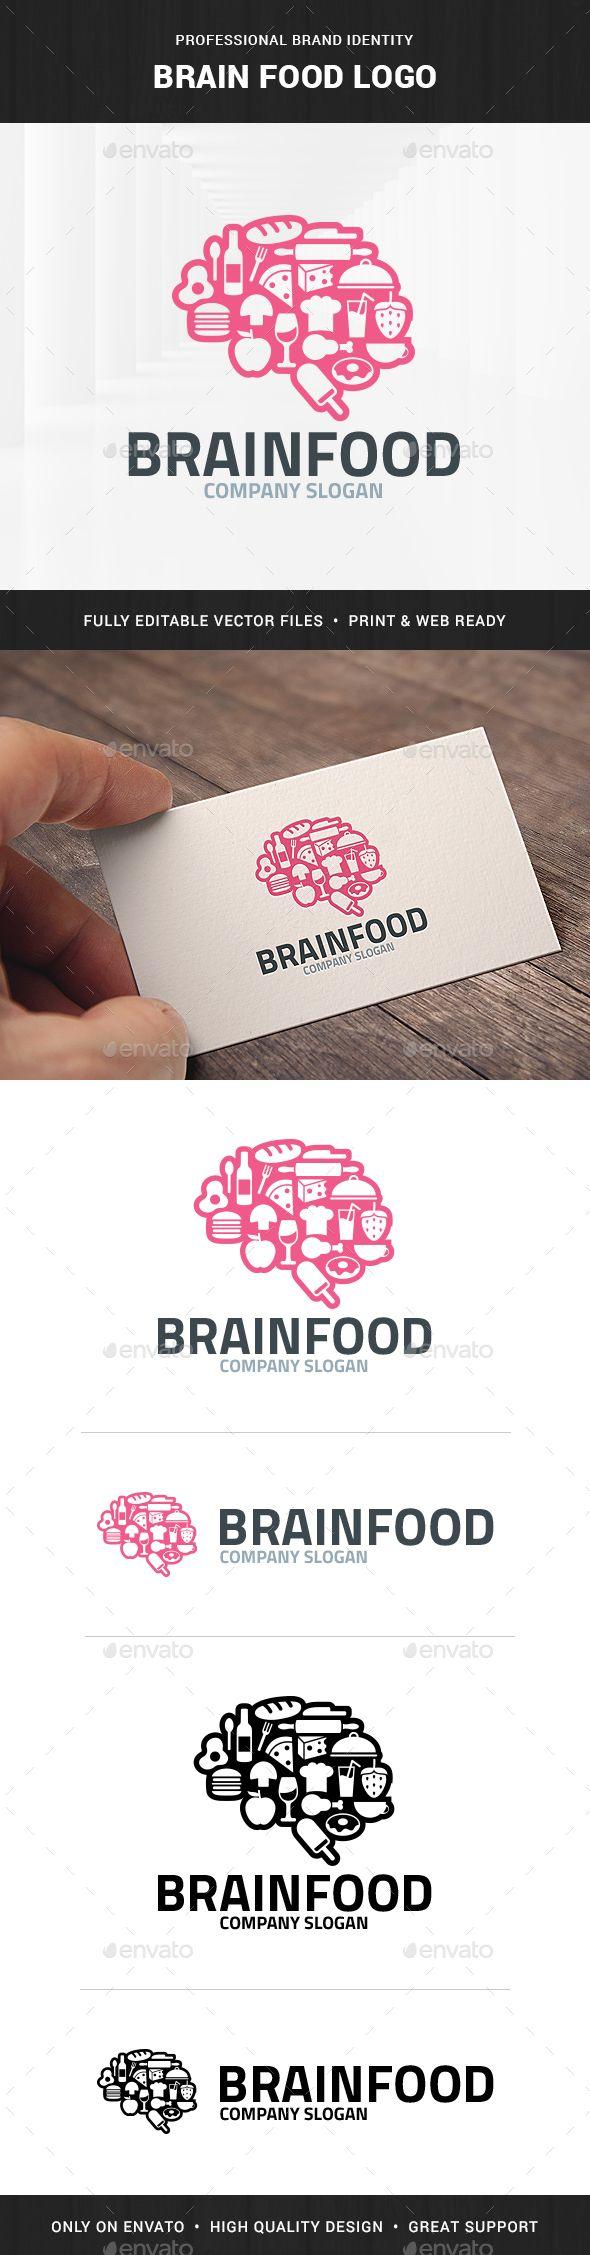 Brain Food Logo Template